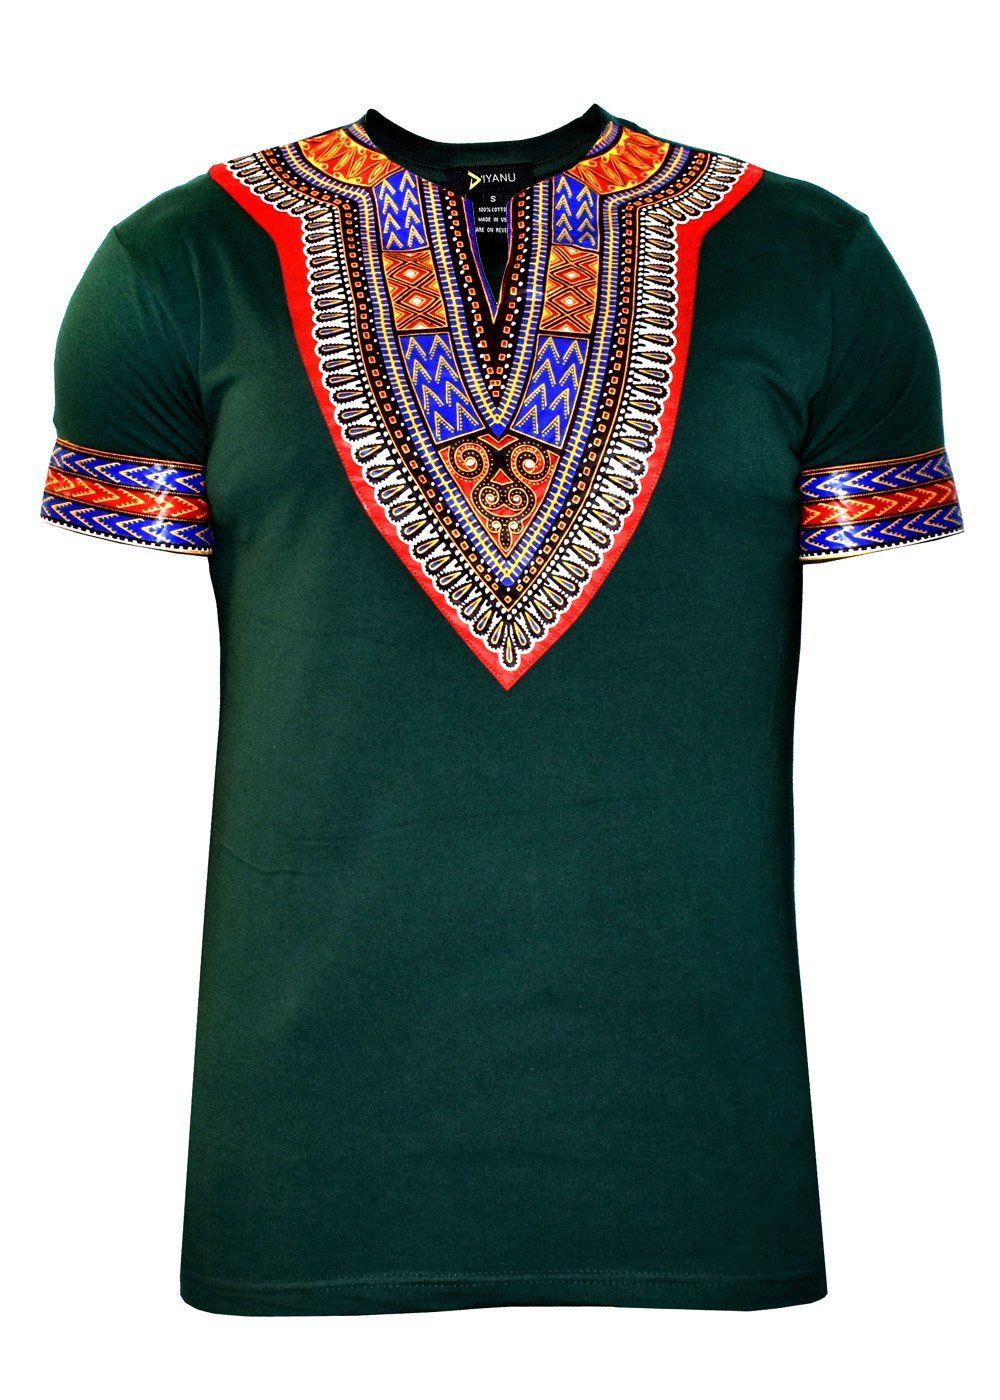 b1e41fc876b2 NEW Men s African Print Dashiki T-Shirt (Green Red Blue)